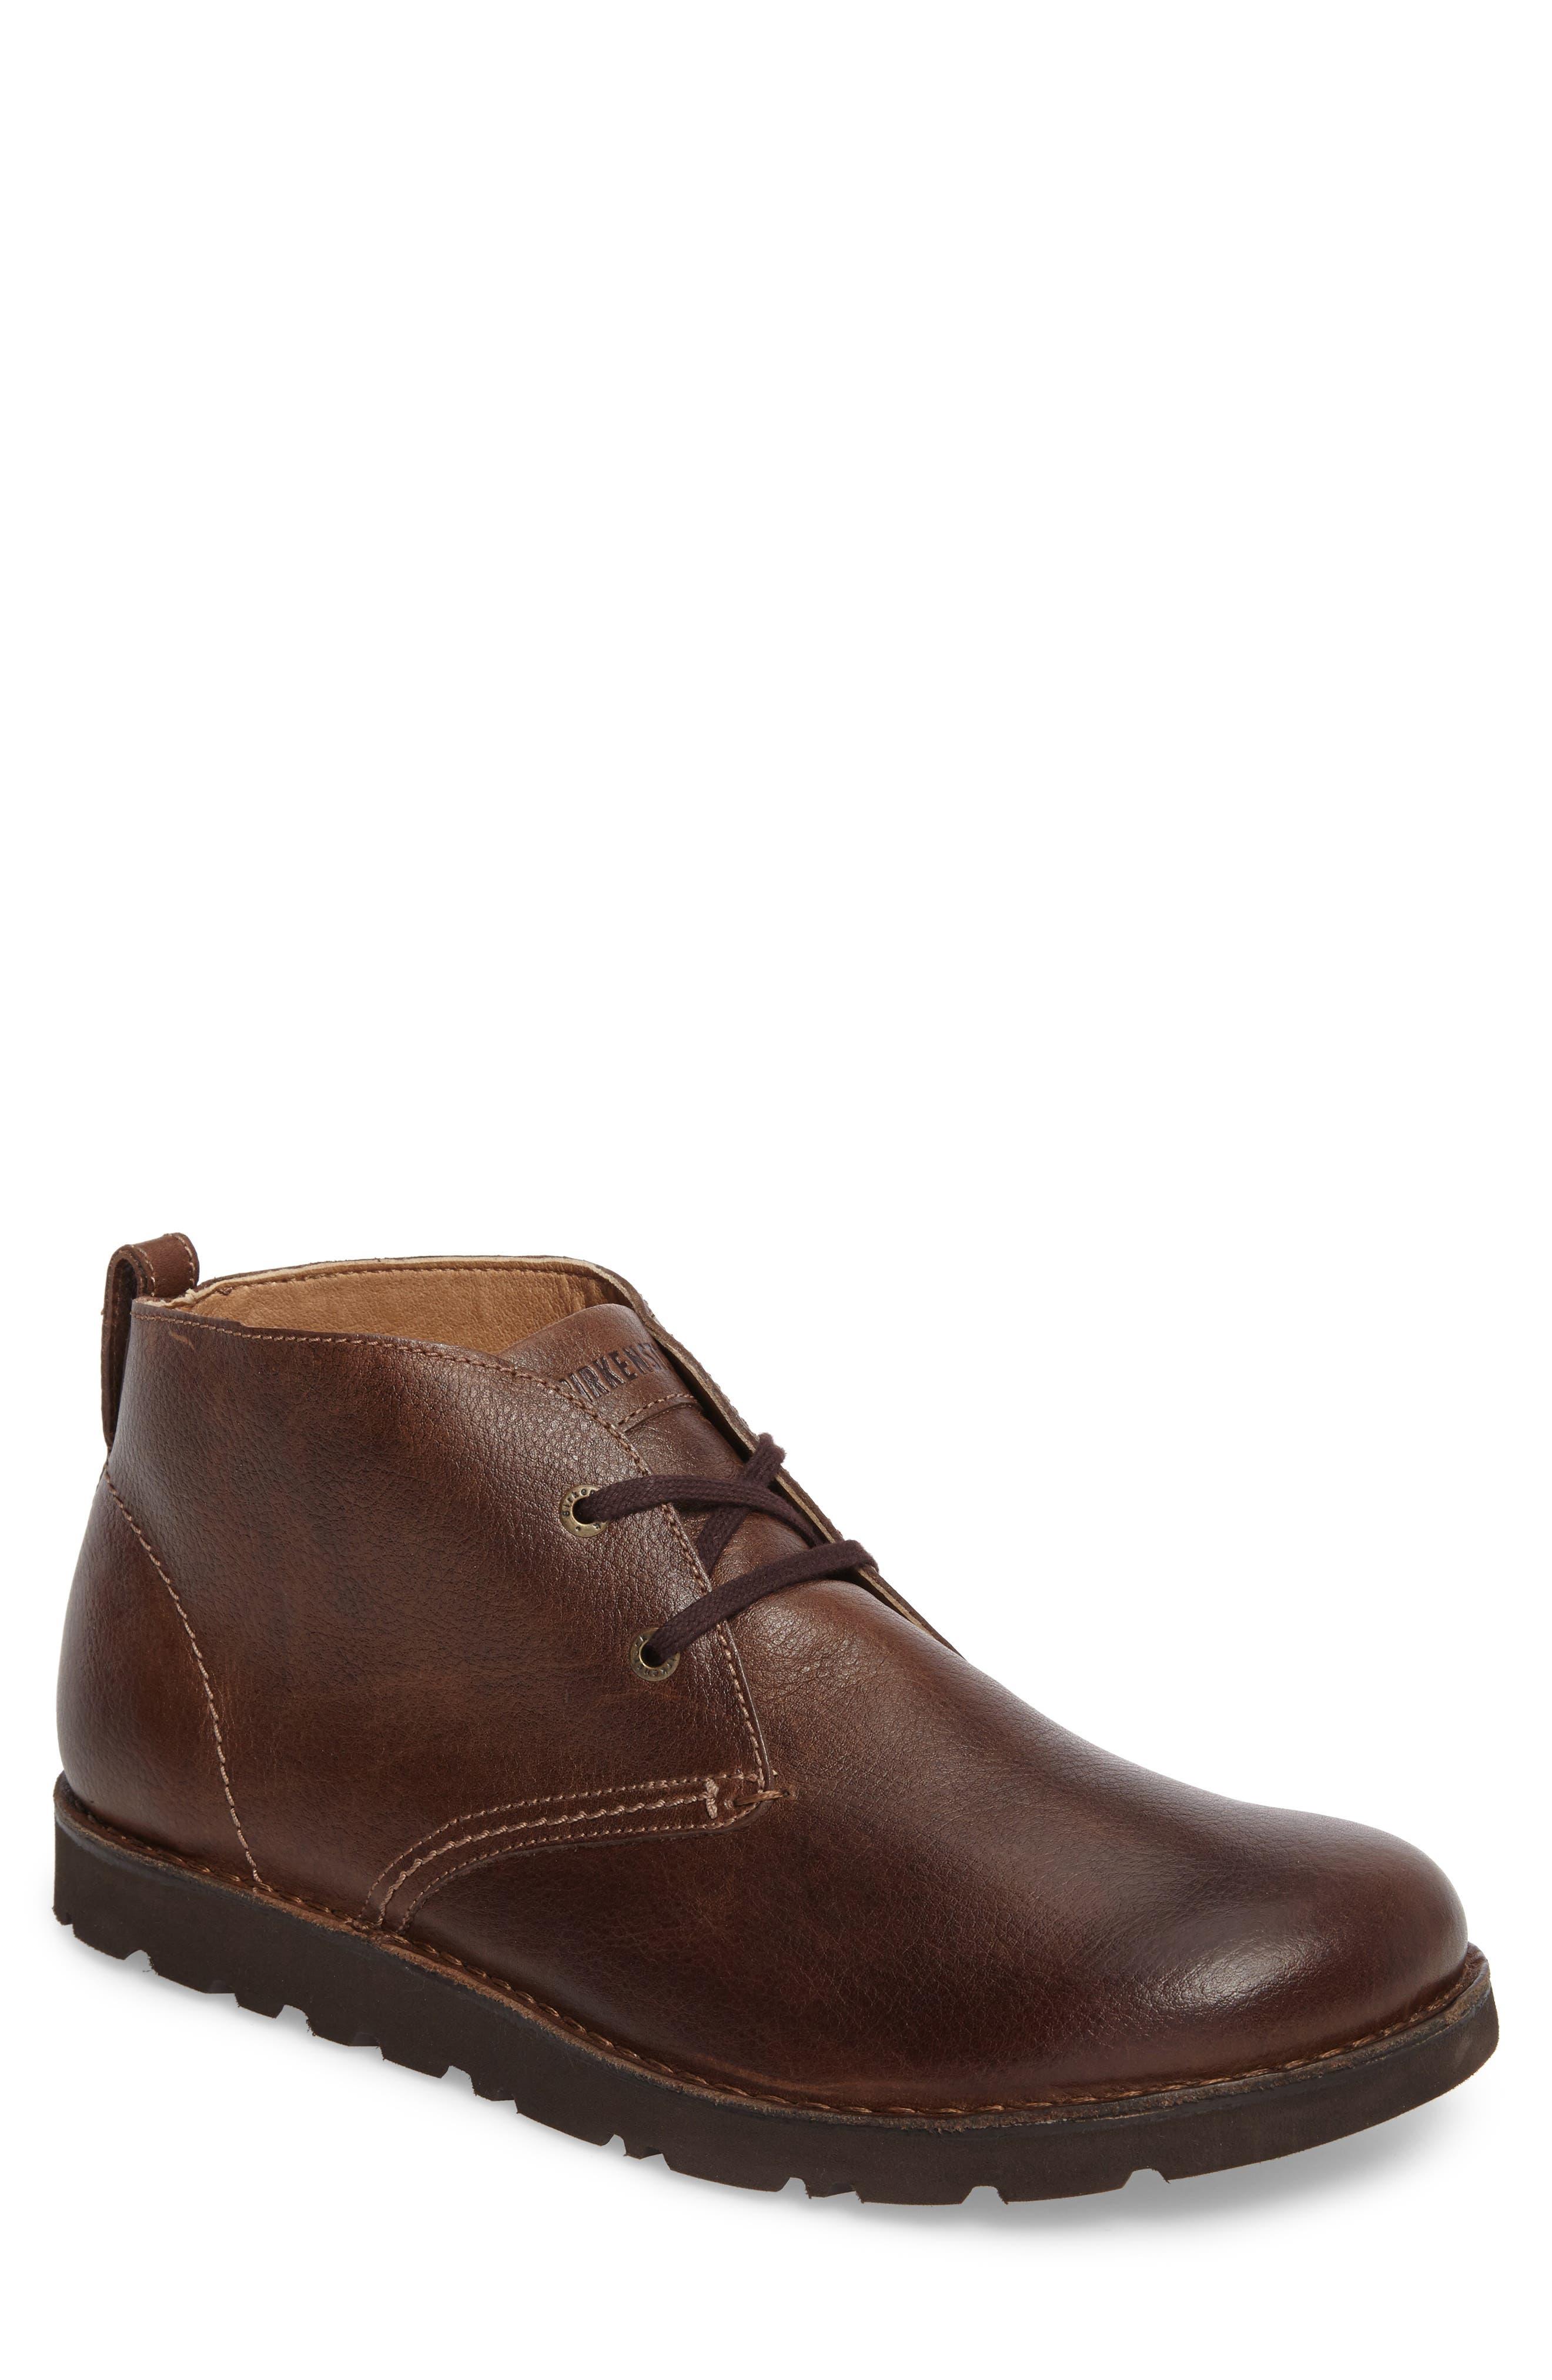 Alternate Image 1 Selected - Birkenstock 'Harris' Chukka Boot (Men)